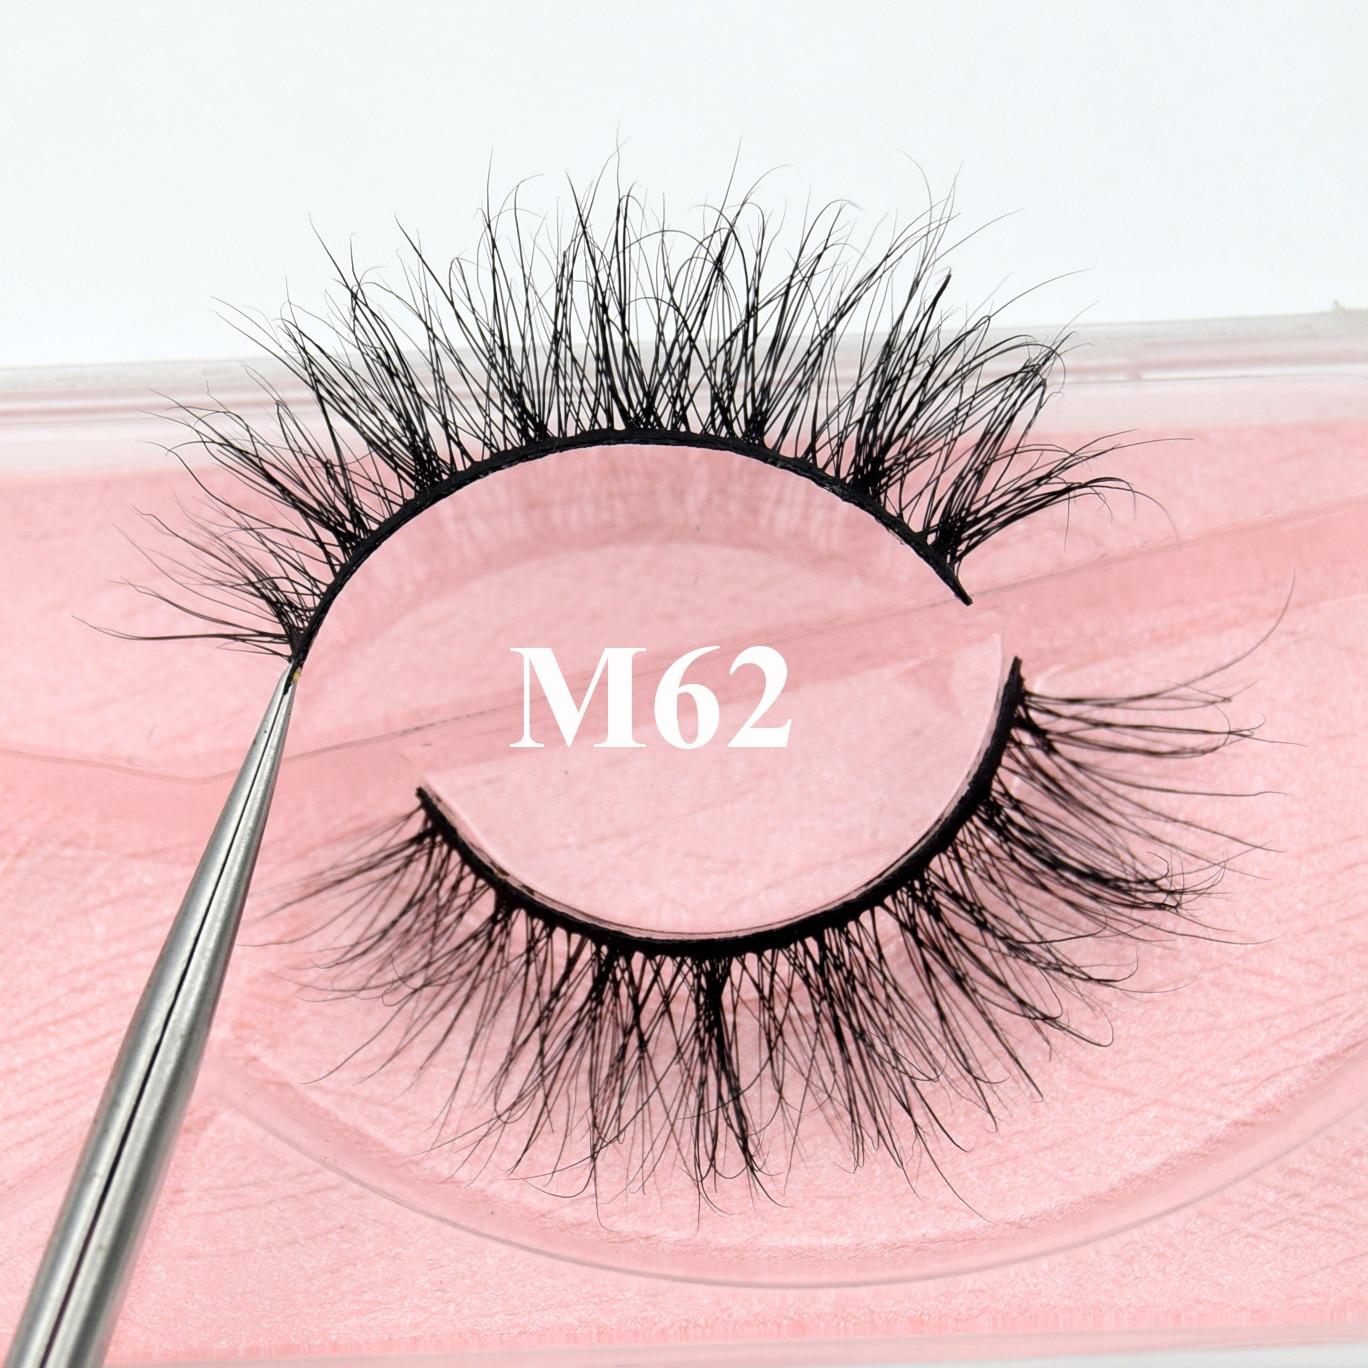 AliExpress - Visofree Mink Lashes natural false eyelashes fake lashes long makeup 3d mink lashes eyelash extension mink eyelashes beauty M62